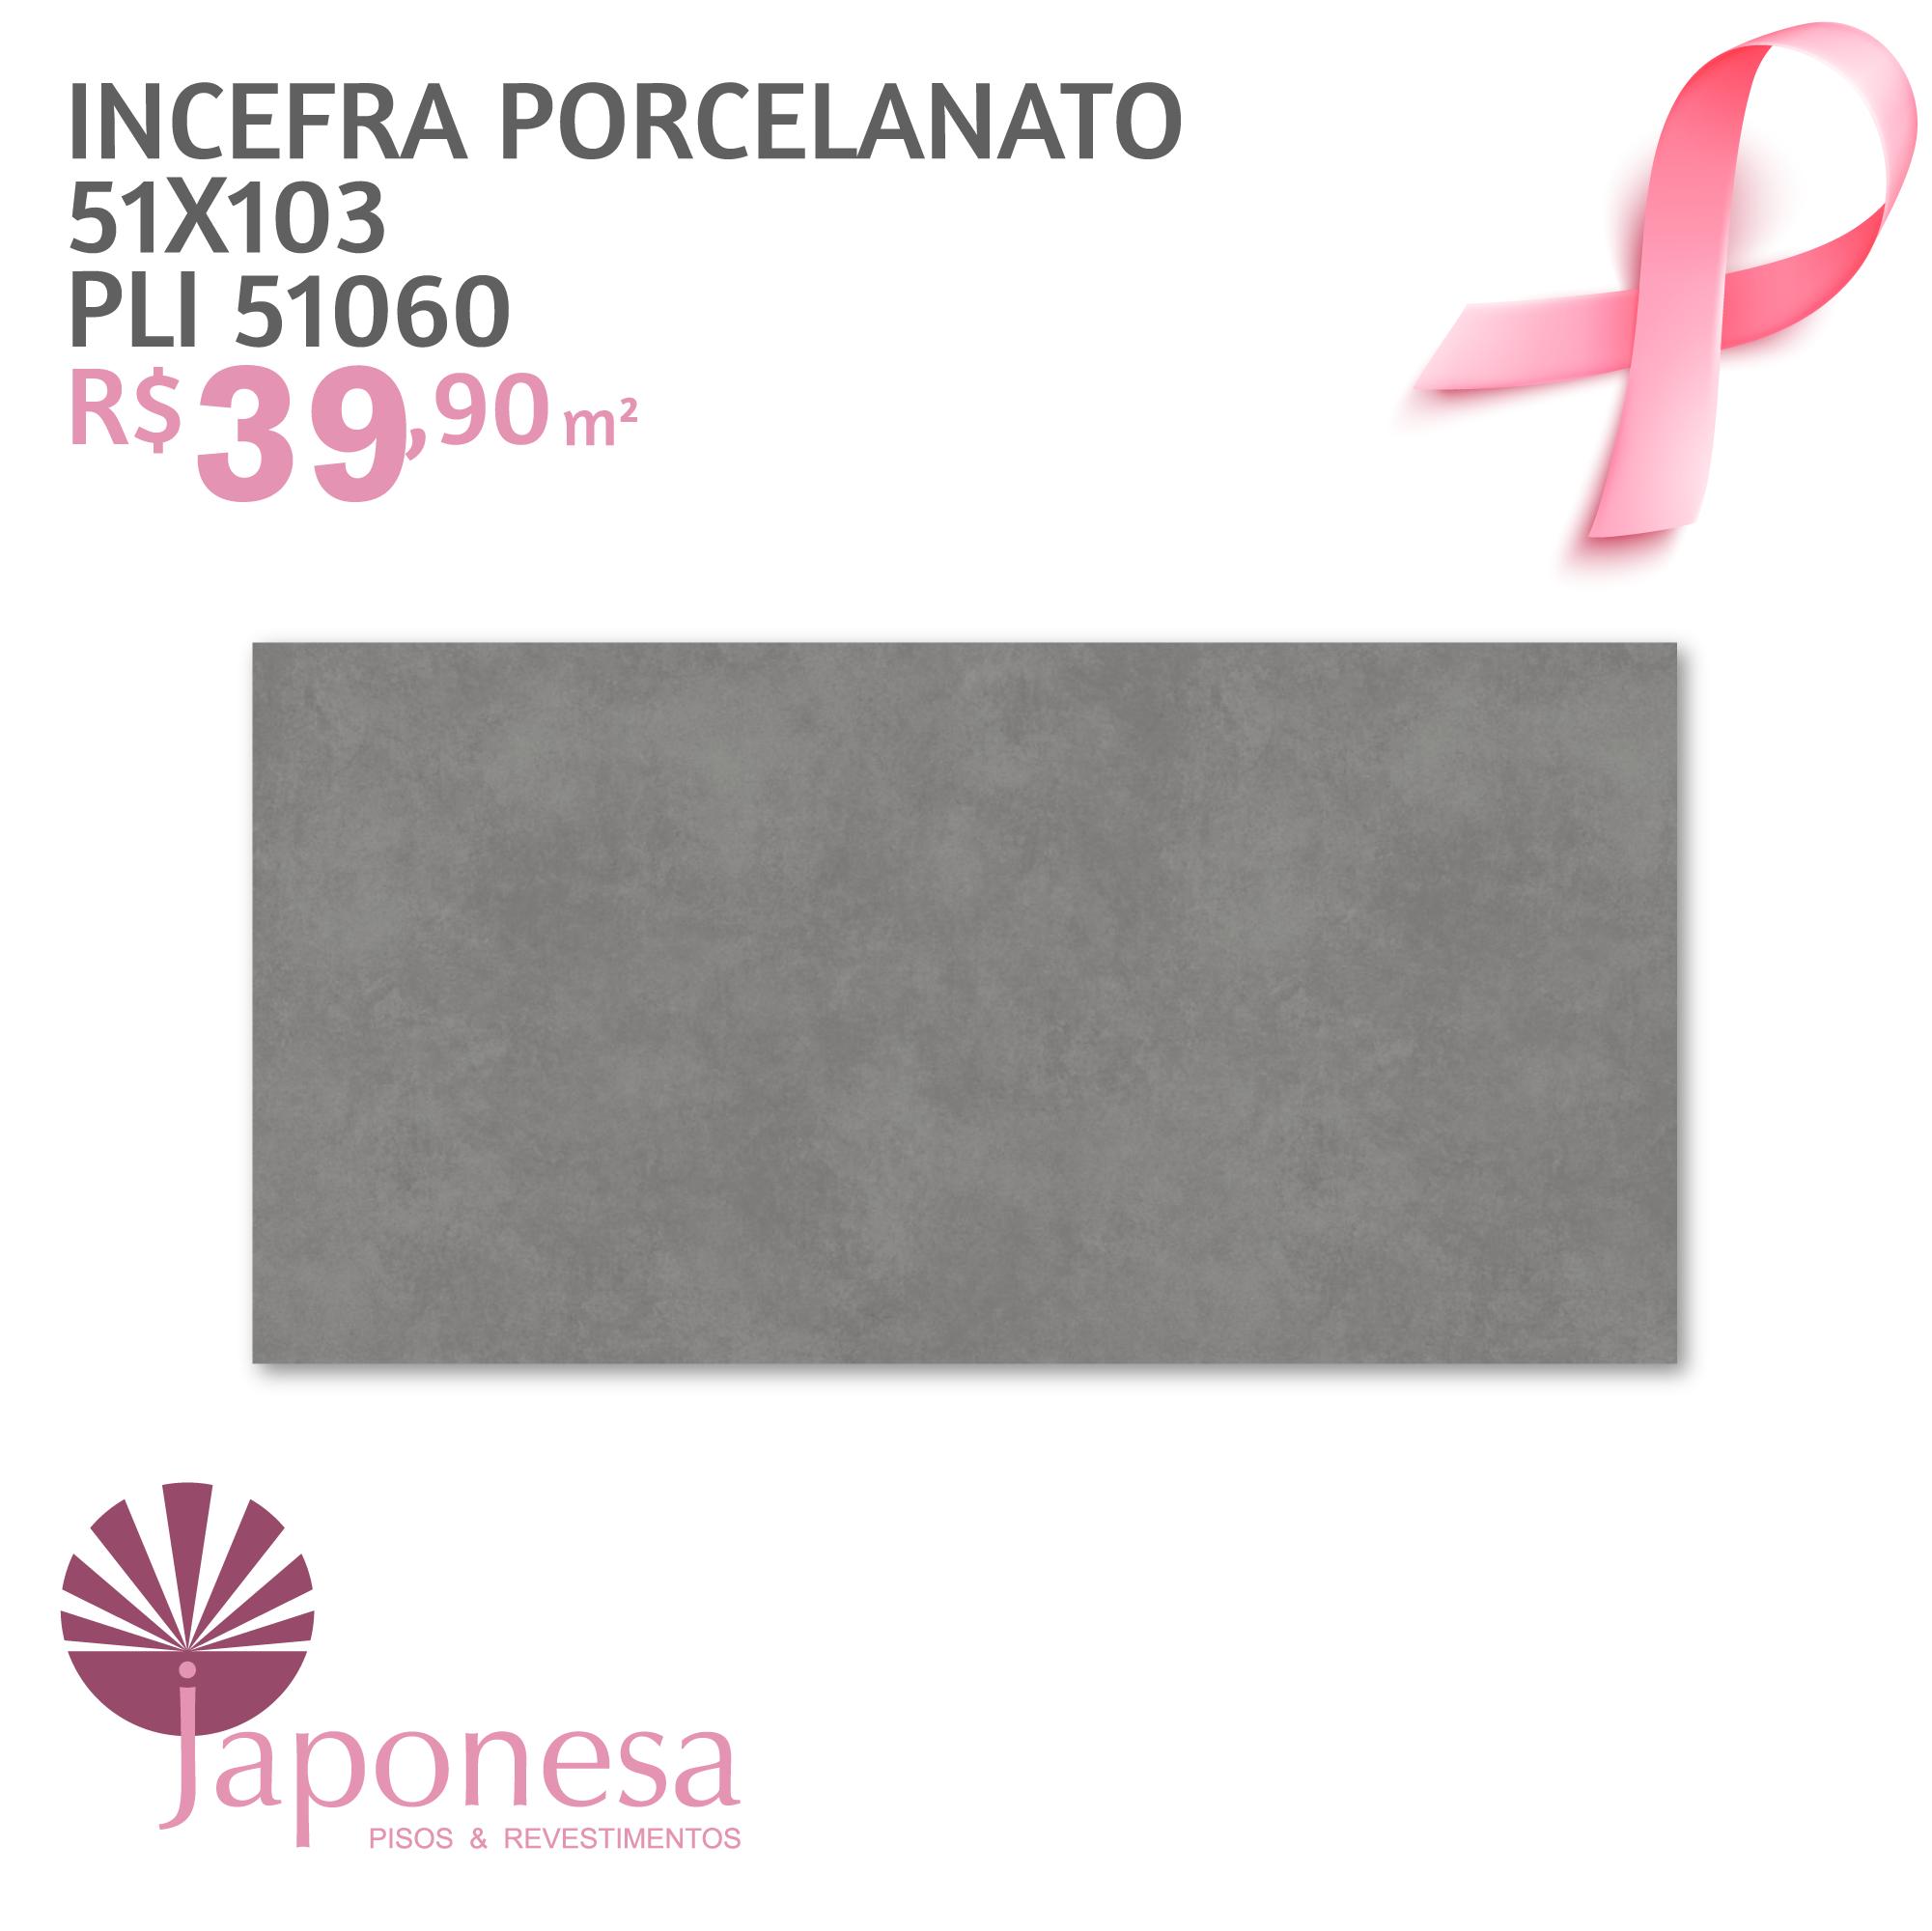 Incefra Porcelanato 51×103 PLI 51060